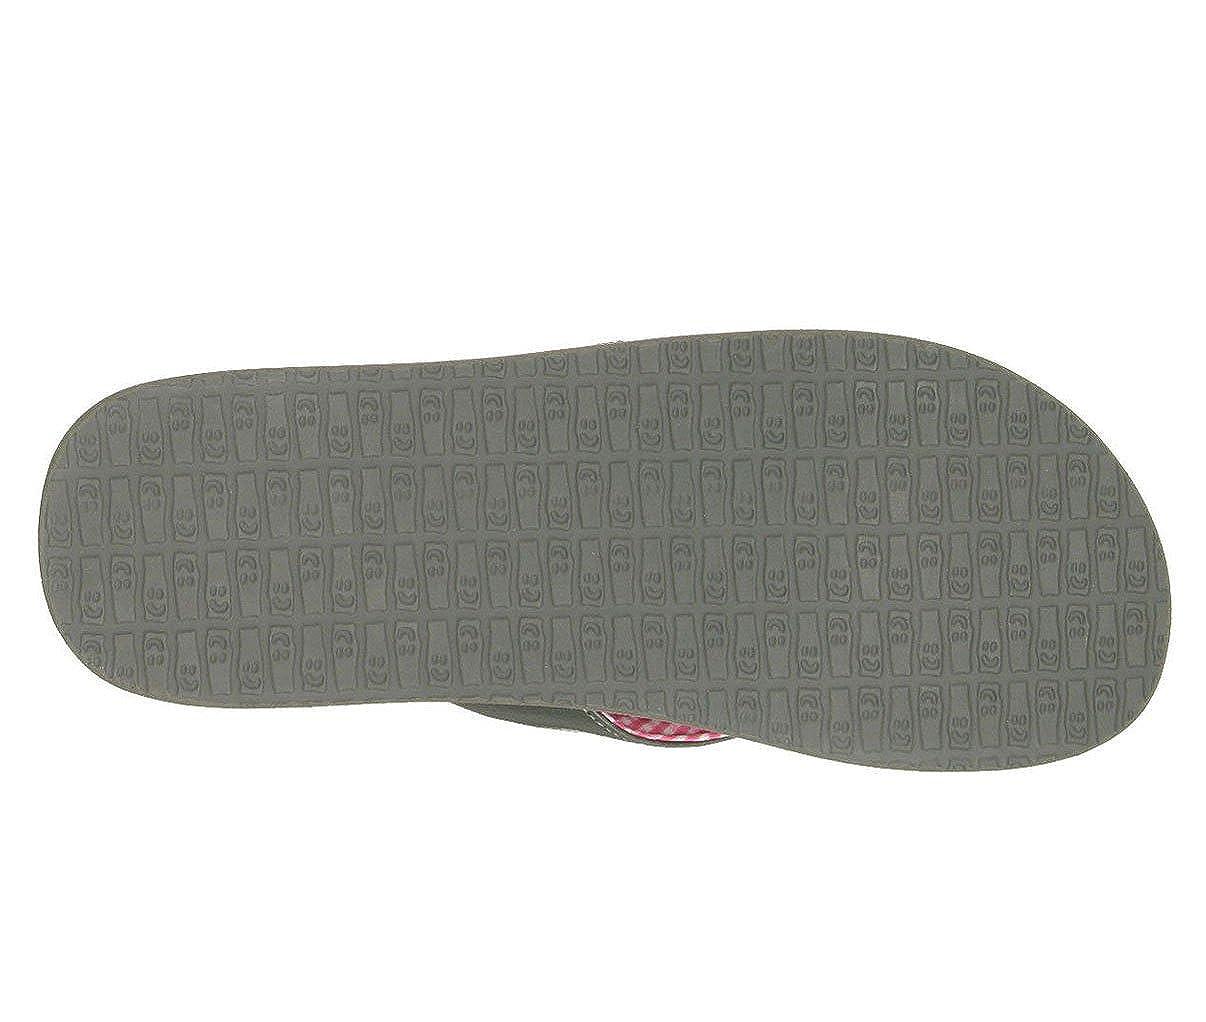 Sanuk Damen Yoga Yoga Yoga Mat Zehentrenner weiß Pointure  c7375f